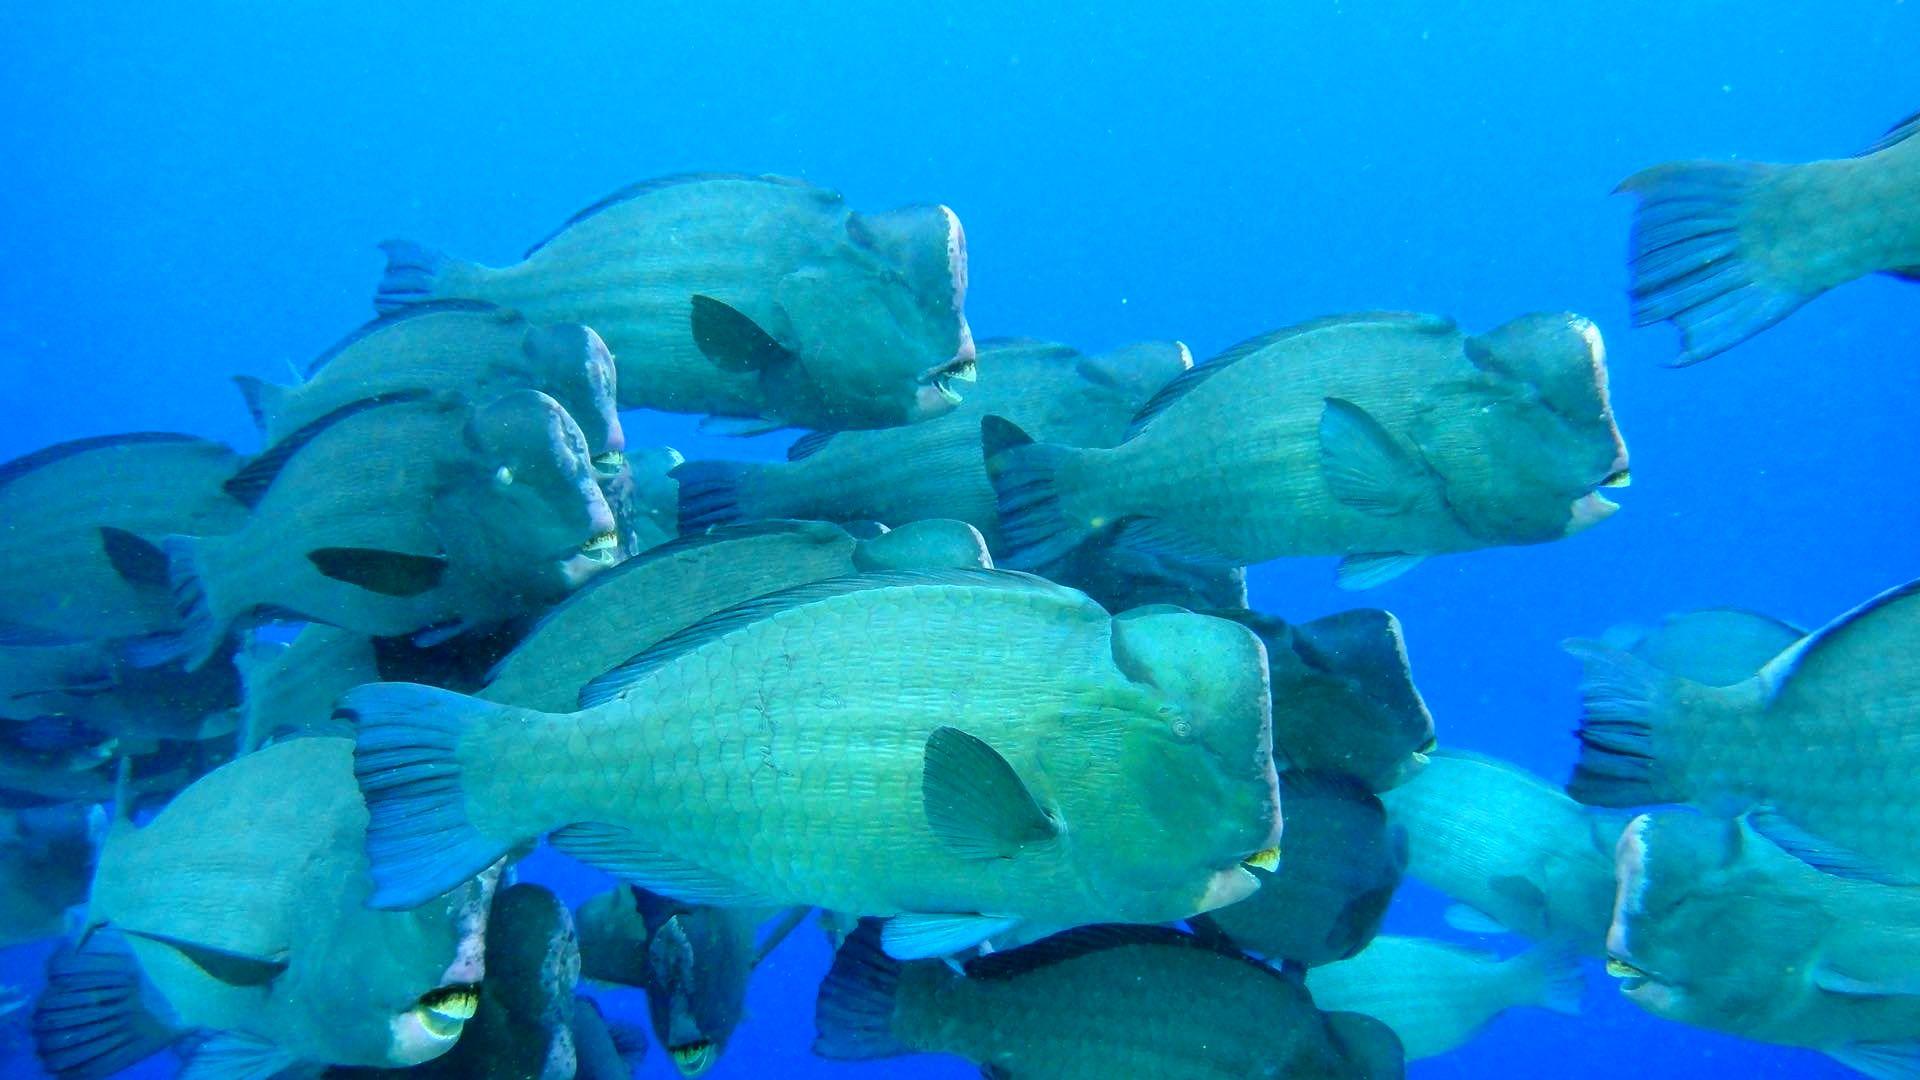 Green humphead parrotfish